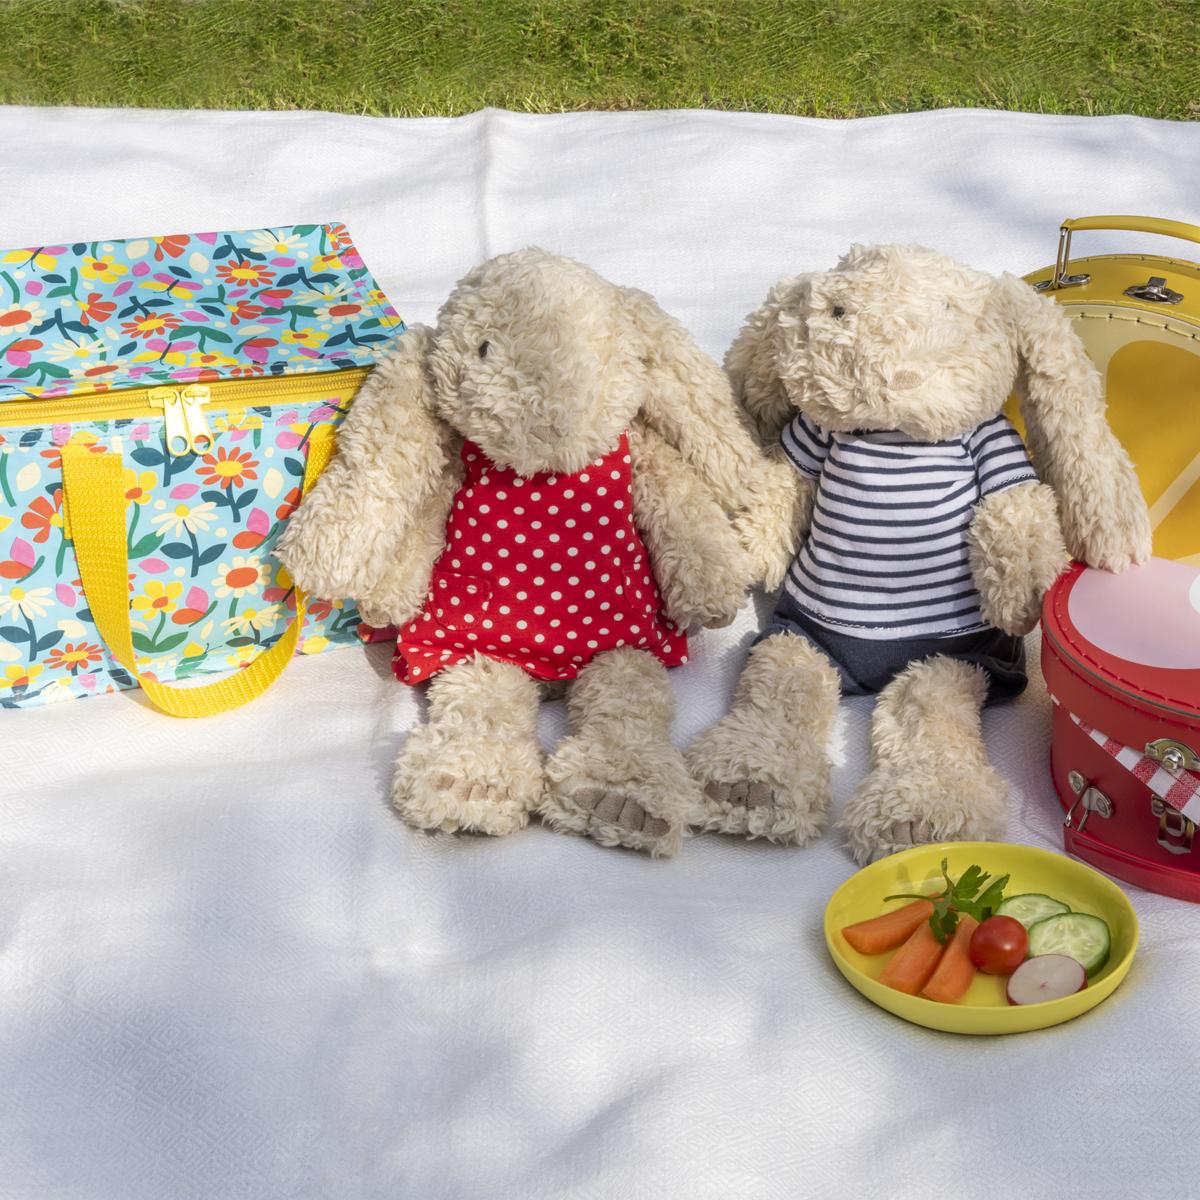 Teddy bears picnic in the garden